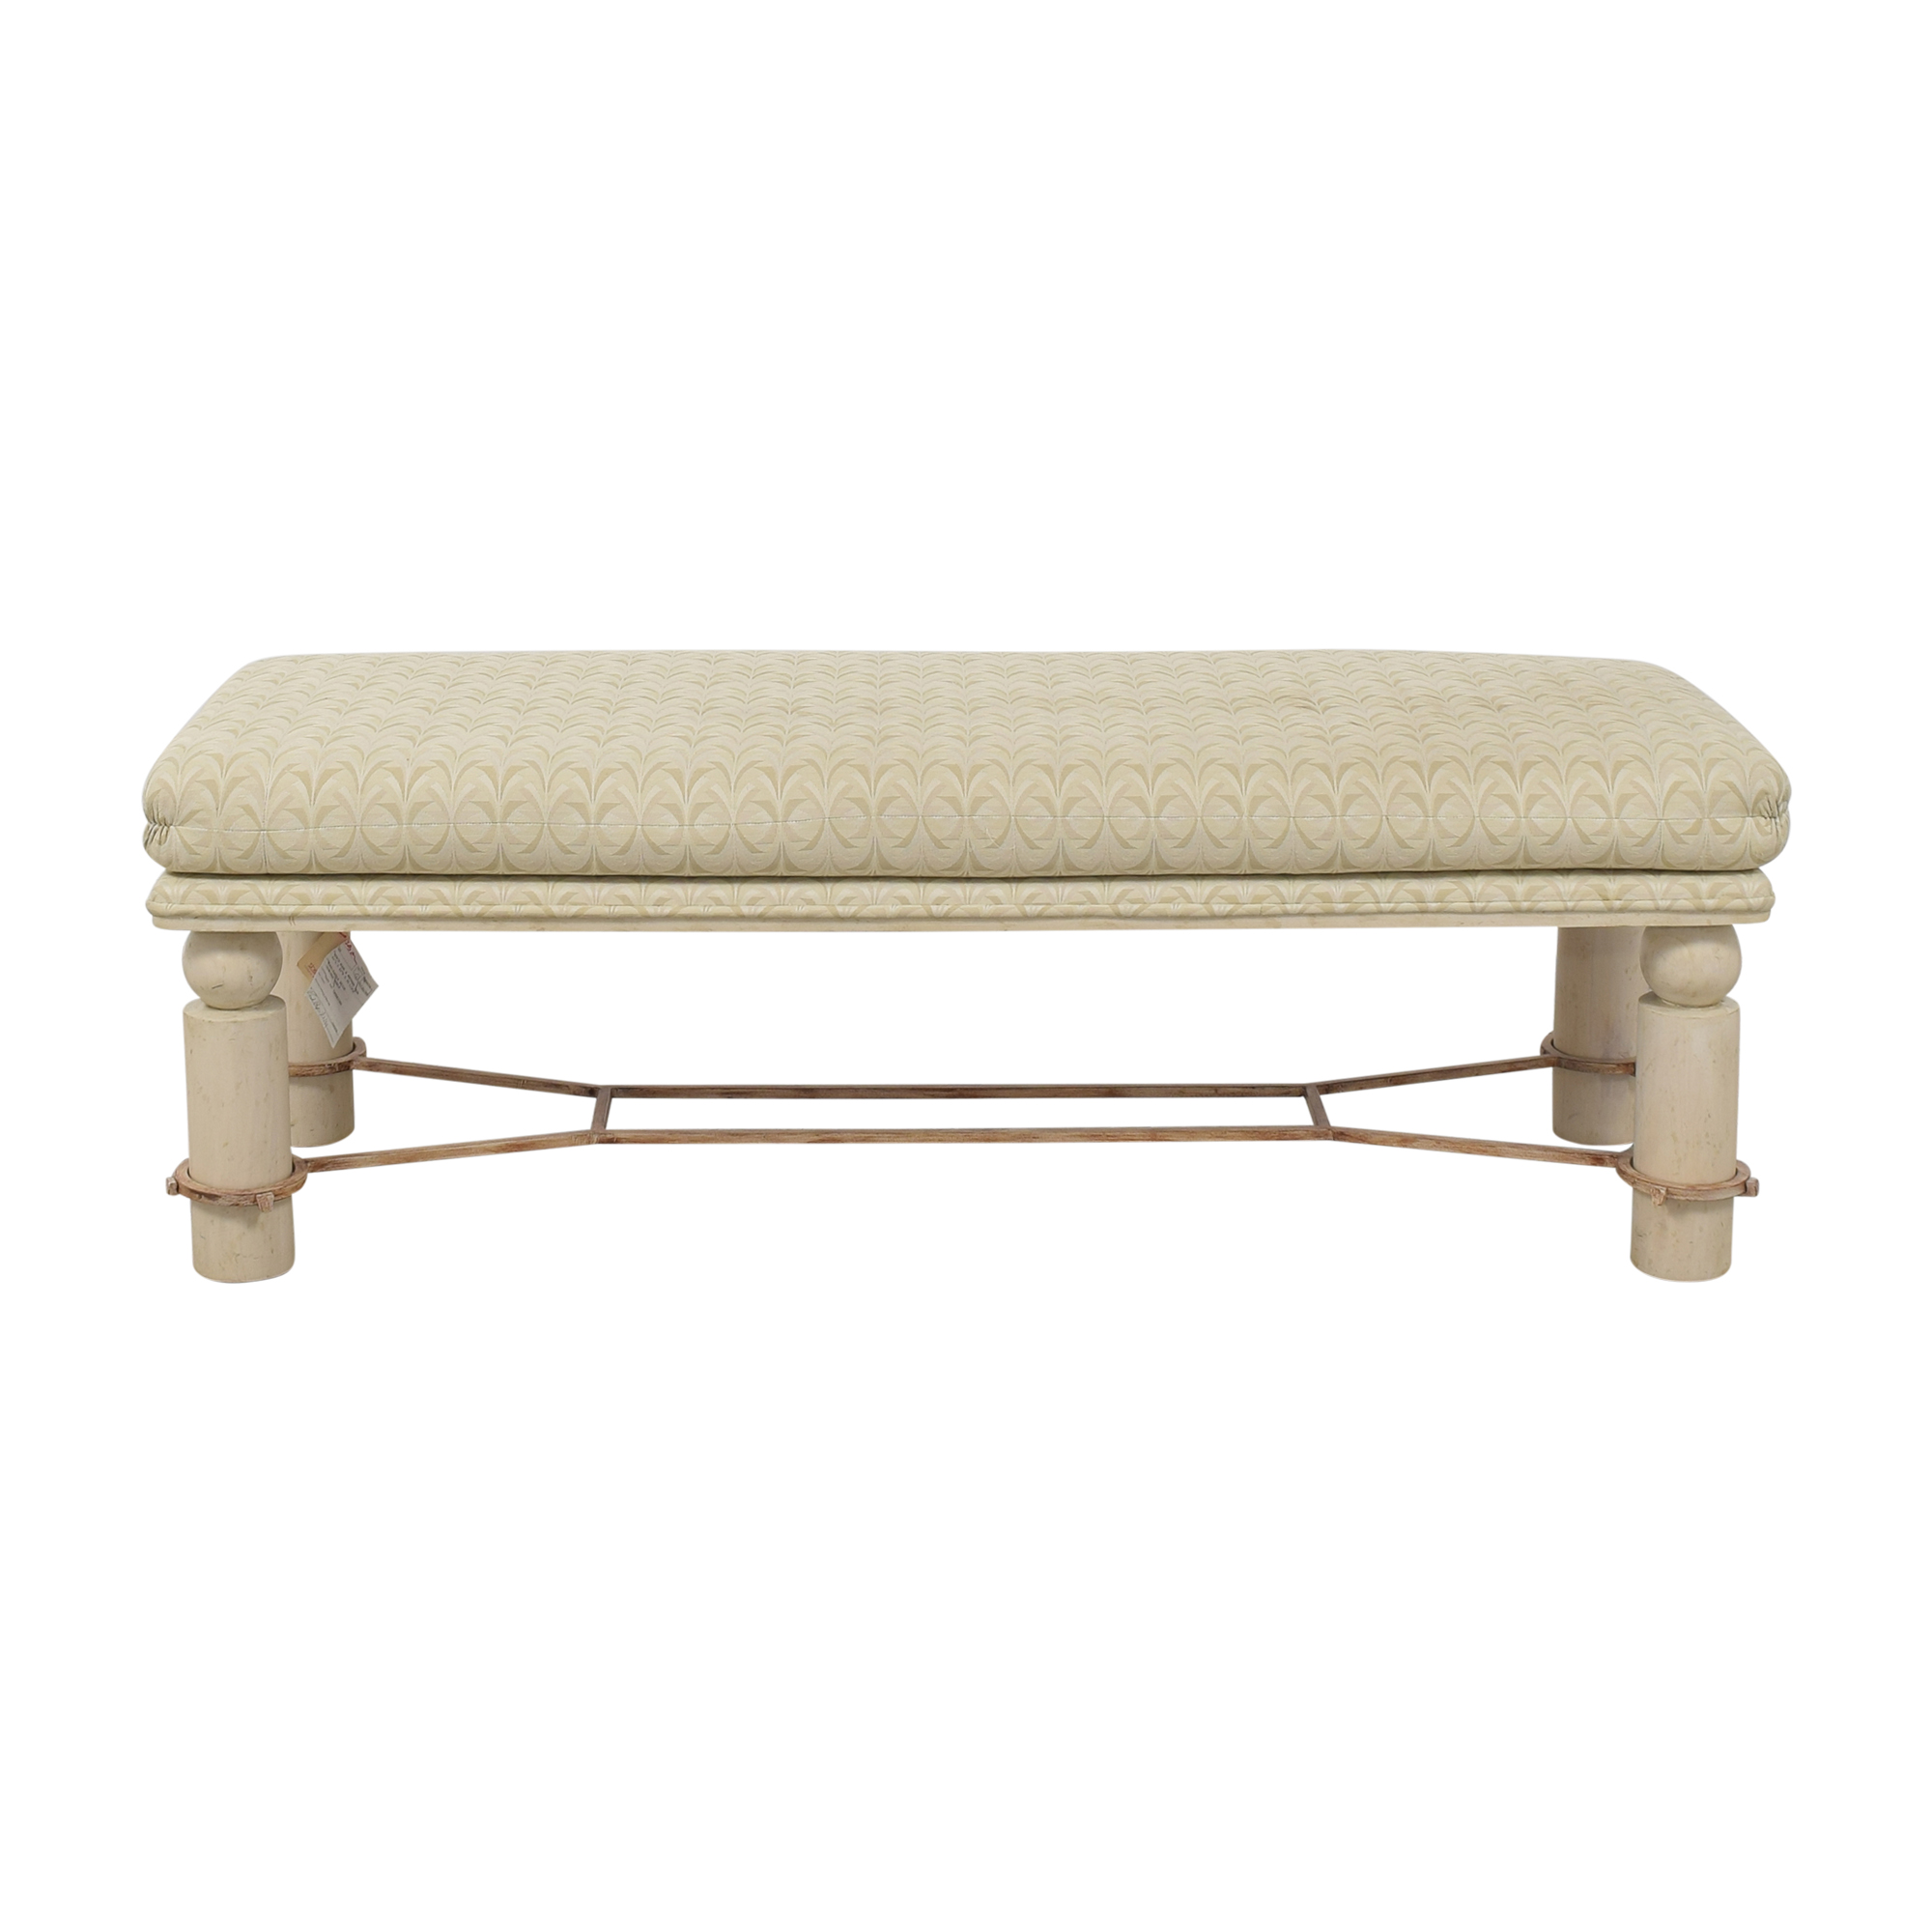 buy The Platt Collections The Platt Collections Upholstered Bench online